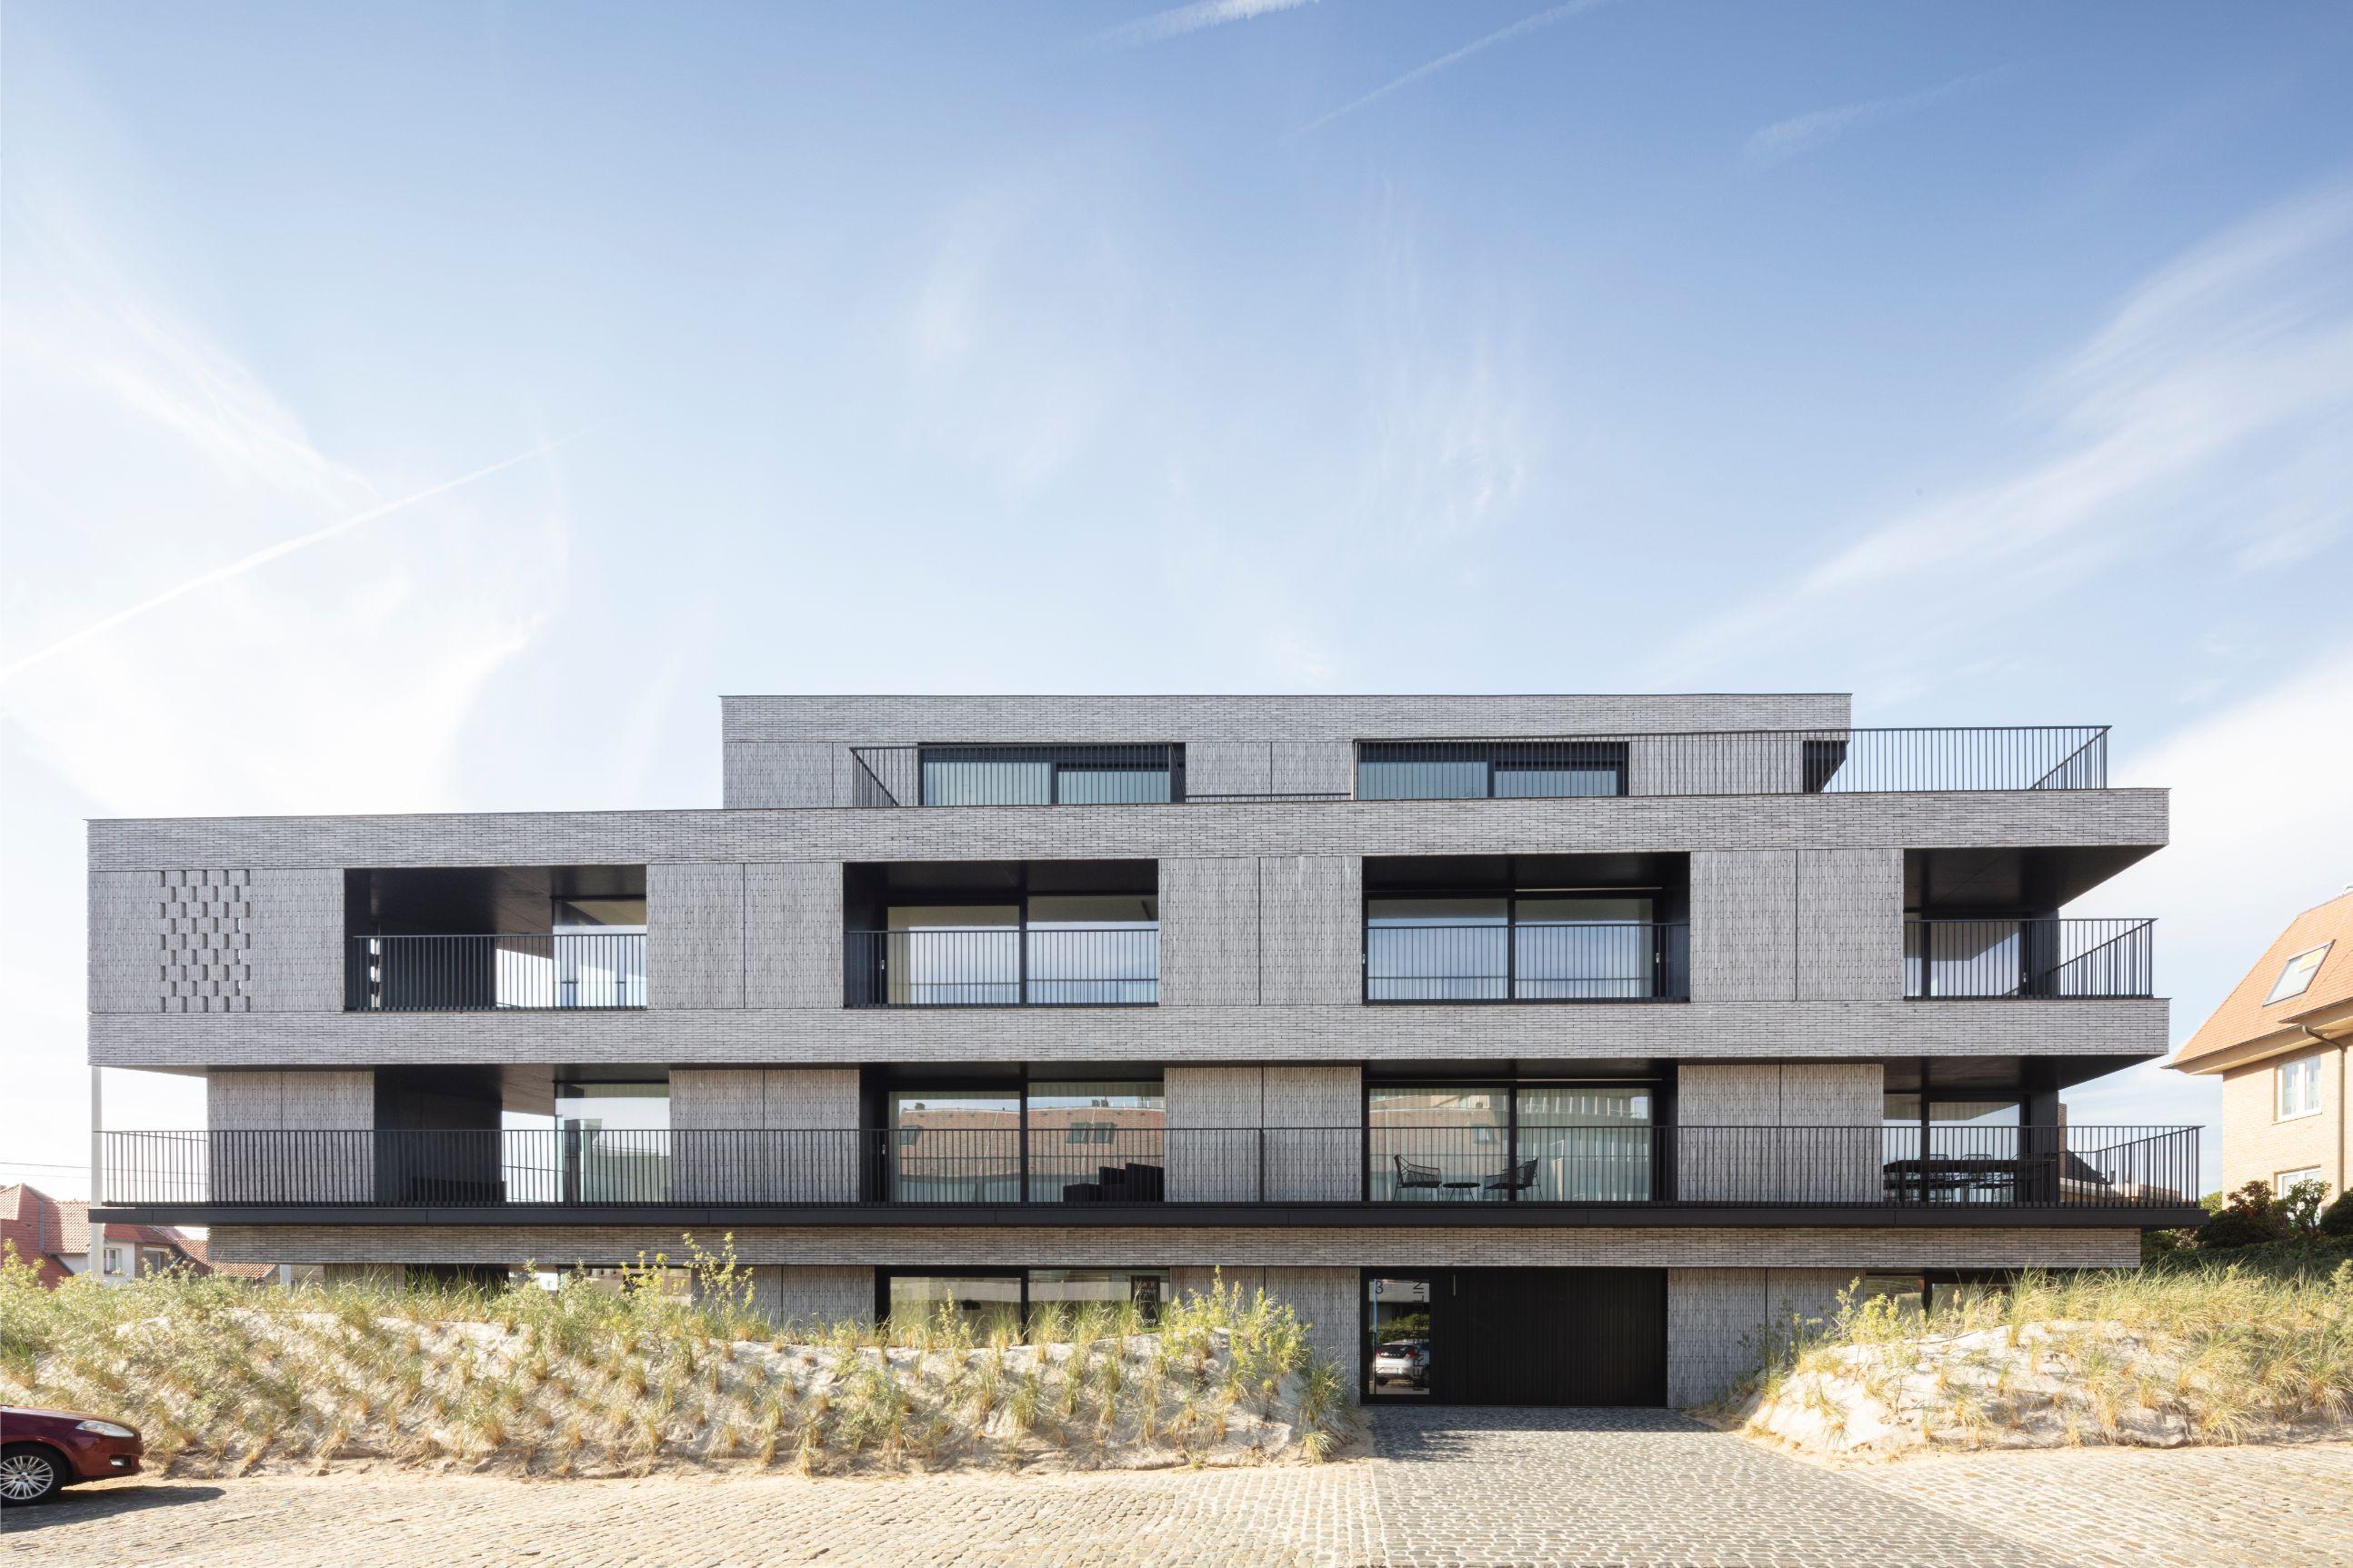 Pierre Paulin - Rietveldprojects - Sint-Idesbald - Tvdv4.jpg